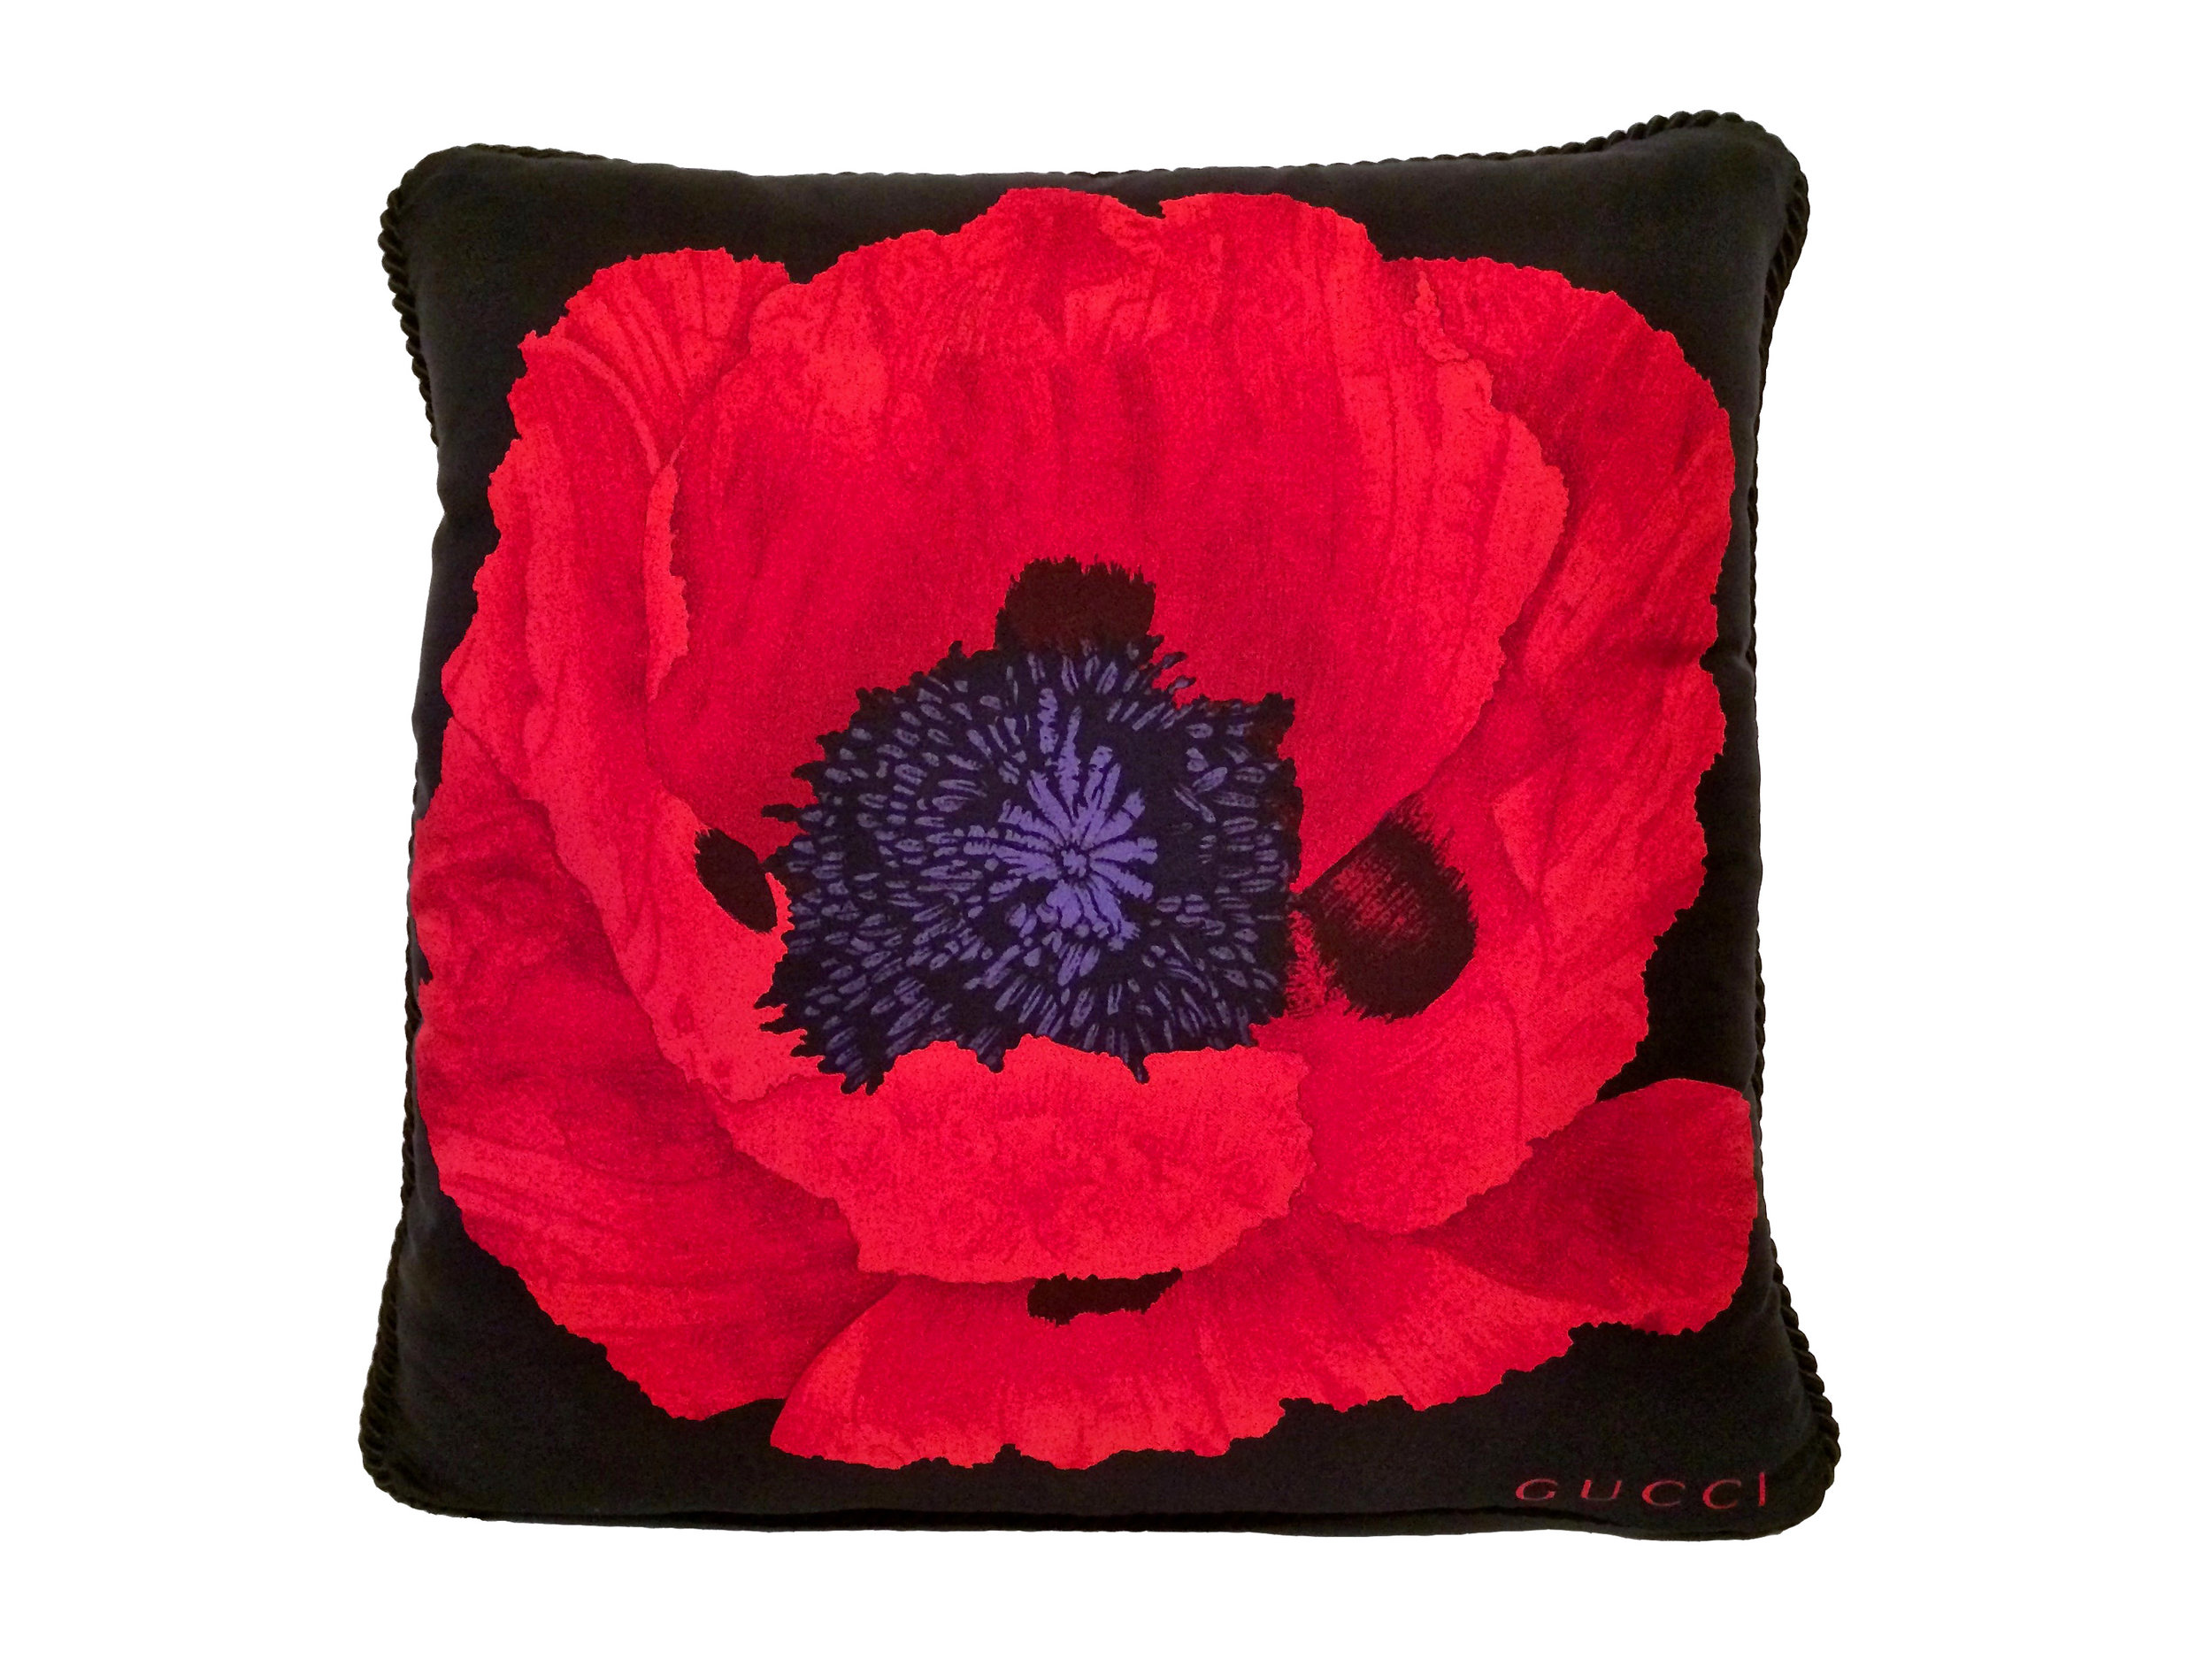 gucci red poppy pillow red black benton art design